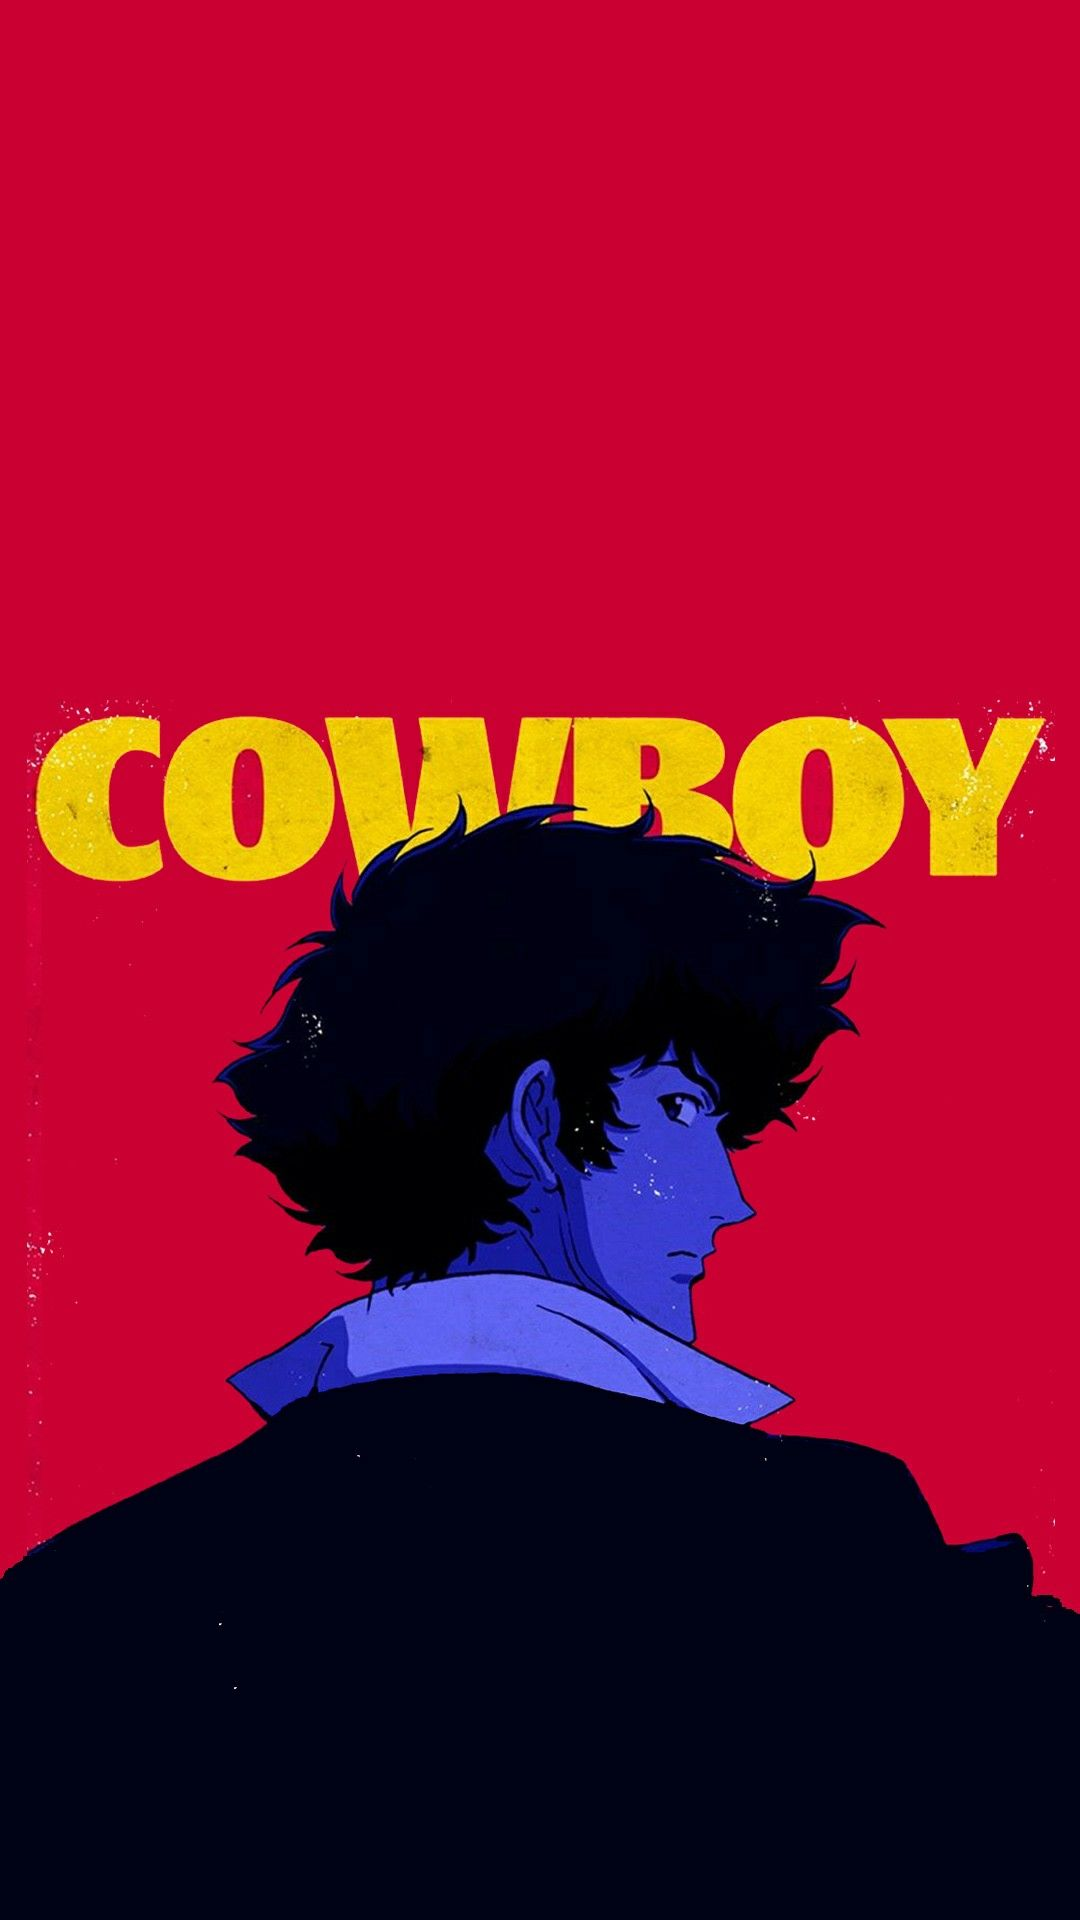 "Н–•ð–Žð–""𝖙𝖊𝖗𝖊𝖘𝖙 Н•¦ð•£ð•—𝕒𝕧𝕠𝕣𝕚𝕥𝕖𝕝𝕠𝕤𝕖𝕣 Cowboy Bebop Anime Cowboy Bebop Wallpapers Aesthetic Anime"